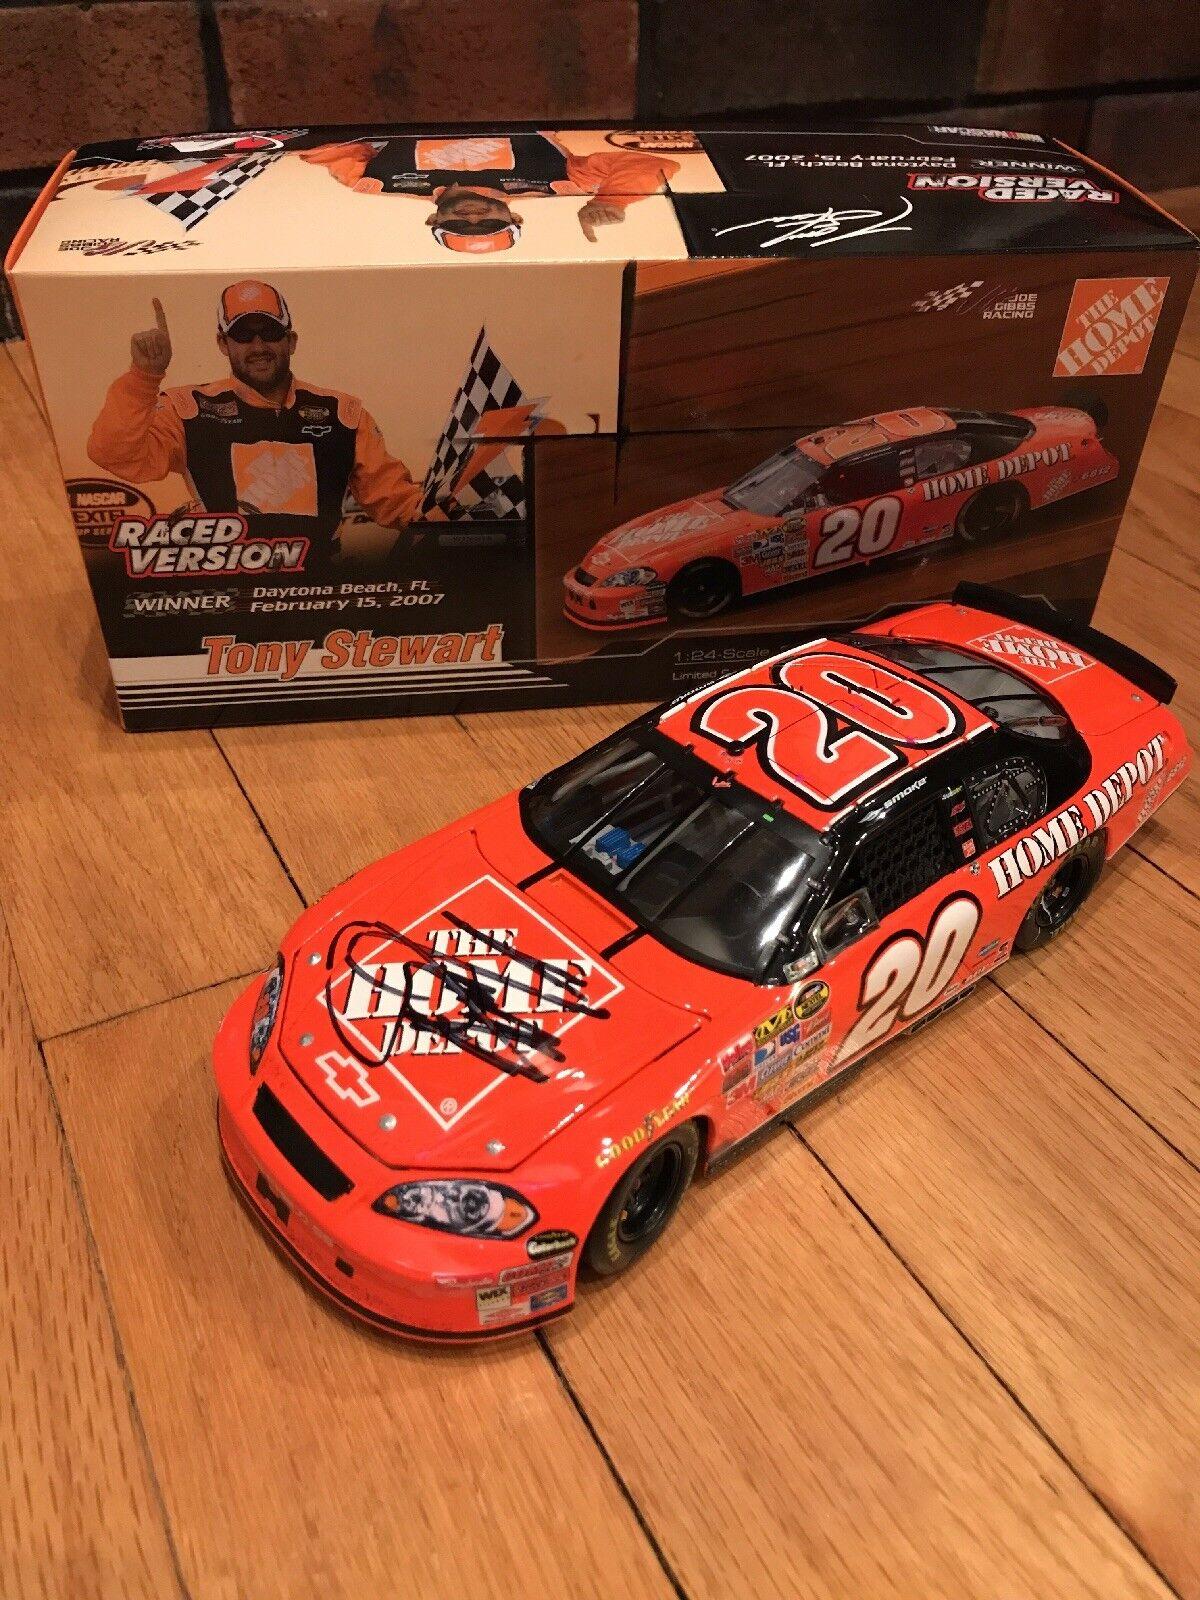 Tony Stewardt 1 24 Daytona 125 Raced Autographed 2007